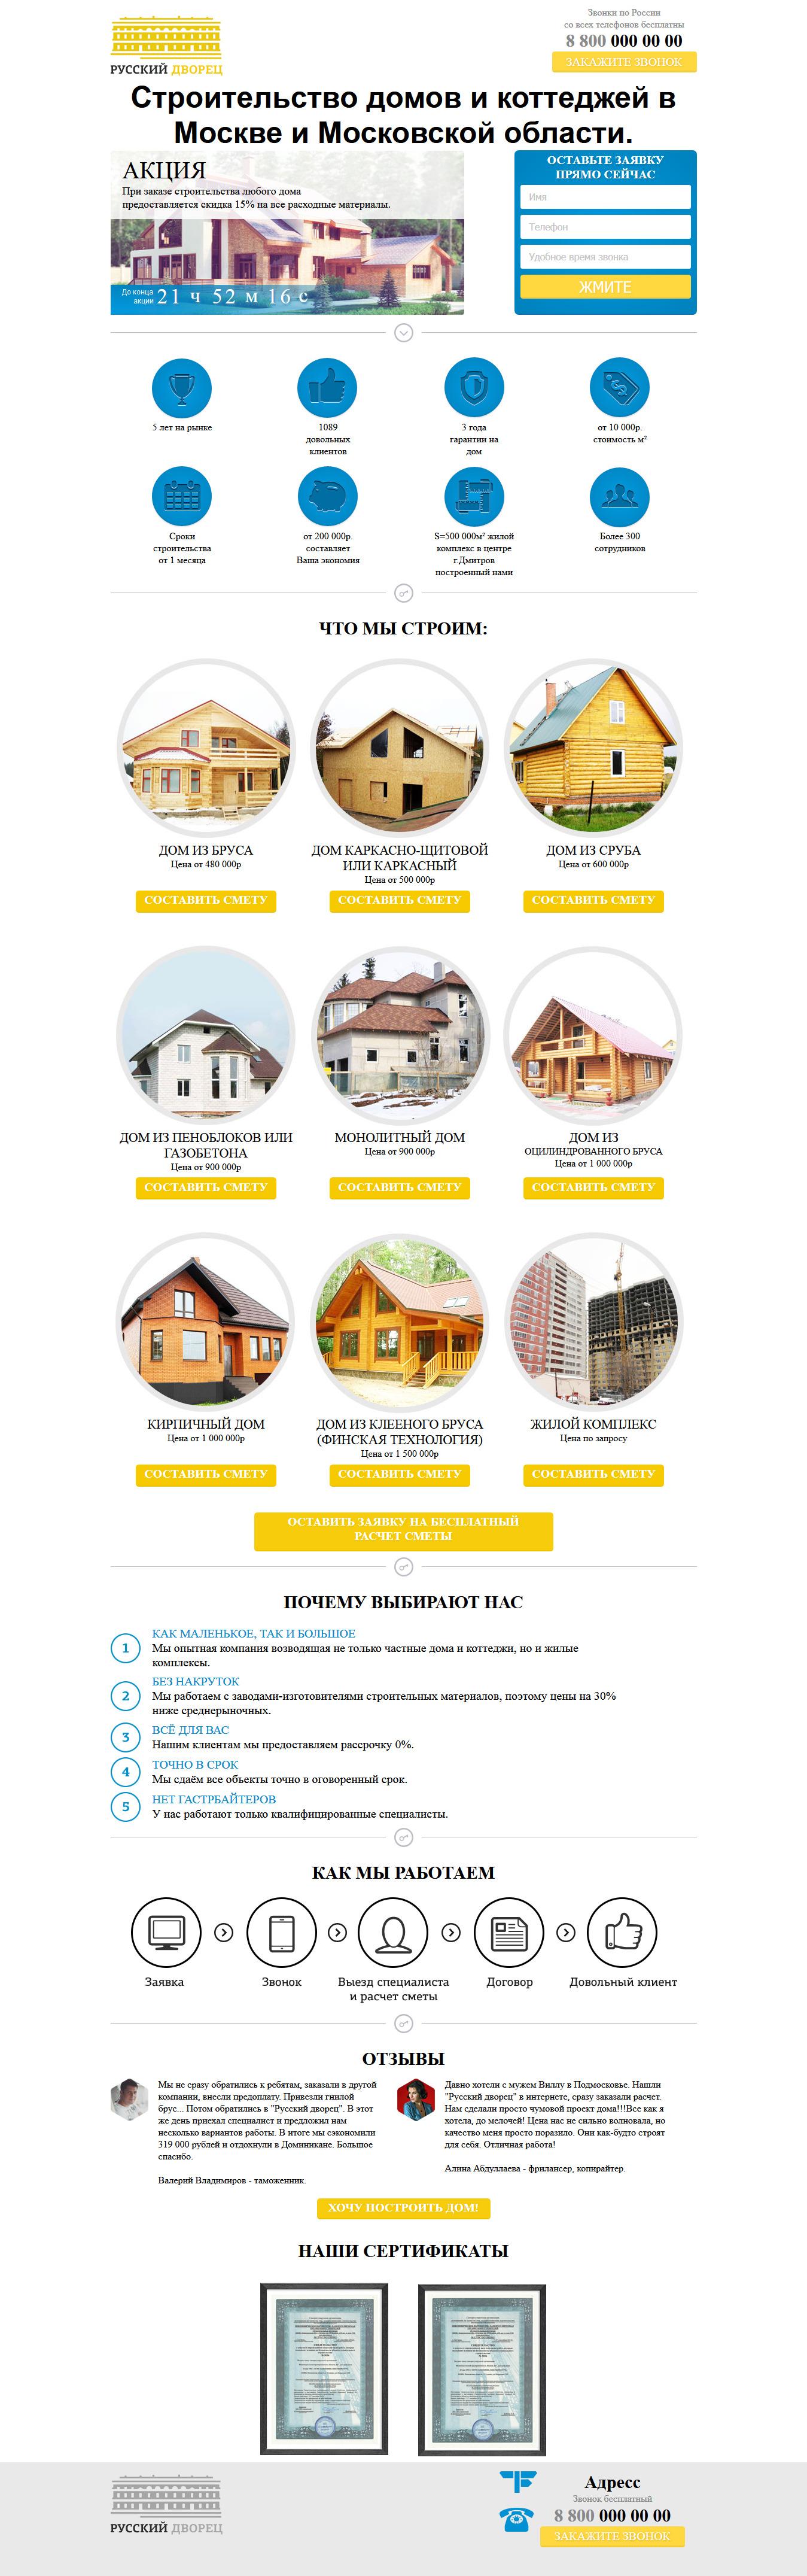 Шаблон лендинга: Строительство любого дома